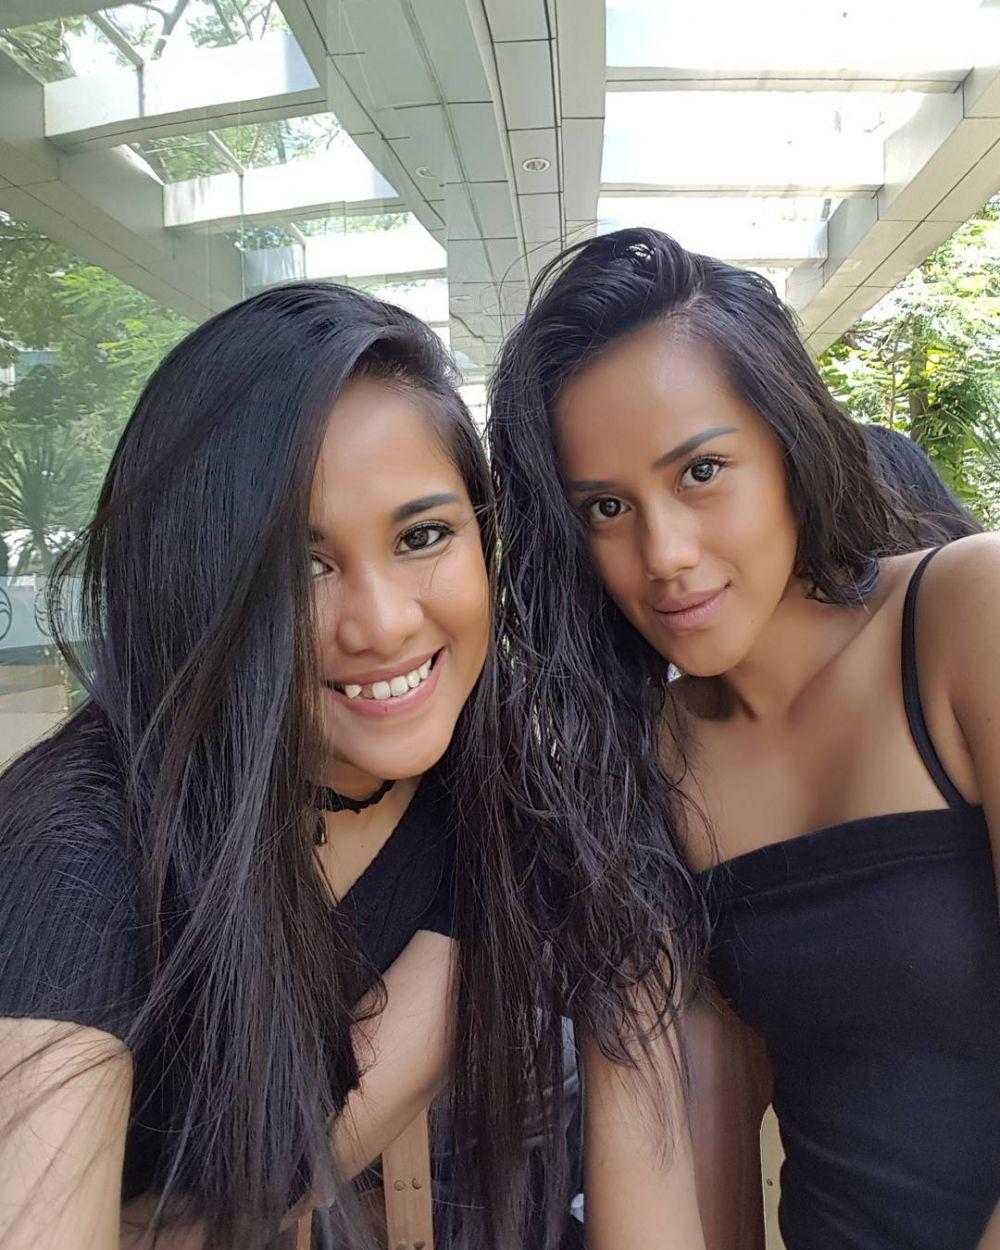 Bak Pinang Dibelah Dua, 10  Artis Kakak Adik Kerap Dikira Kembar